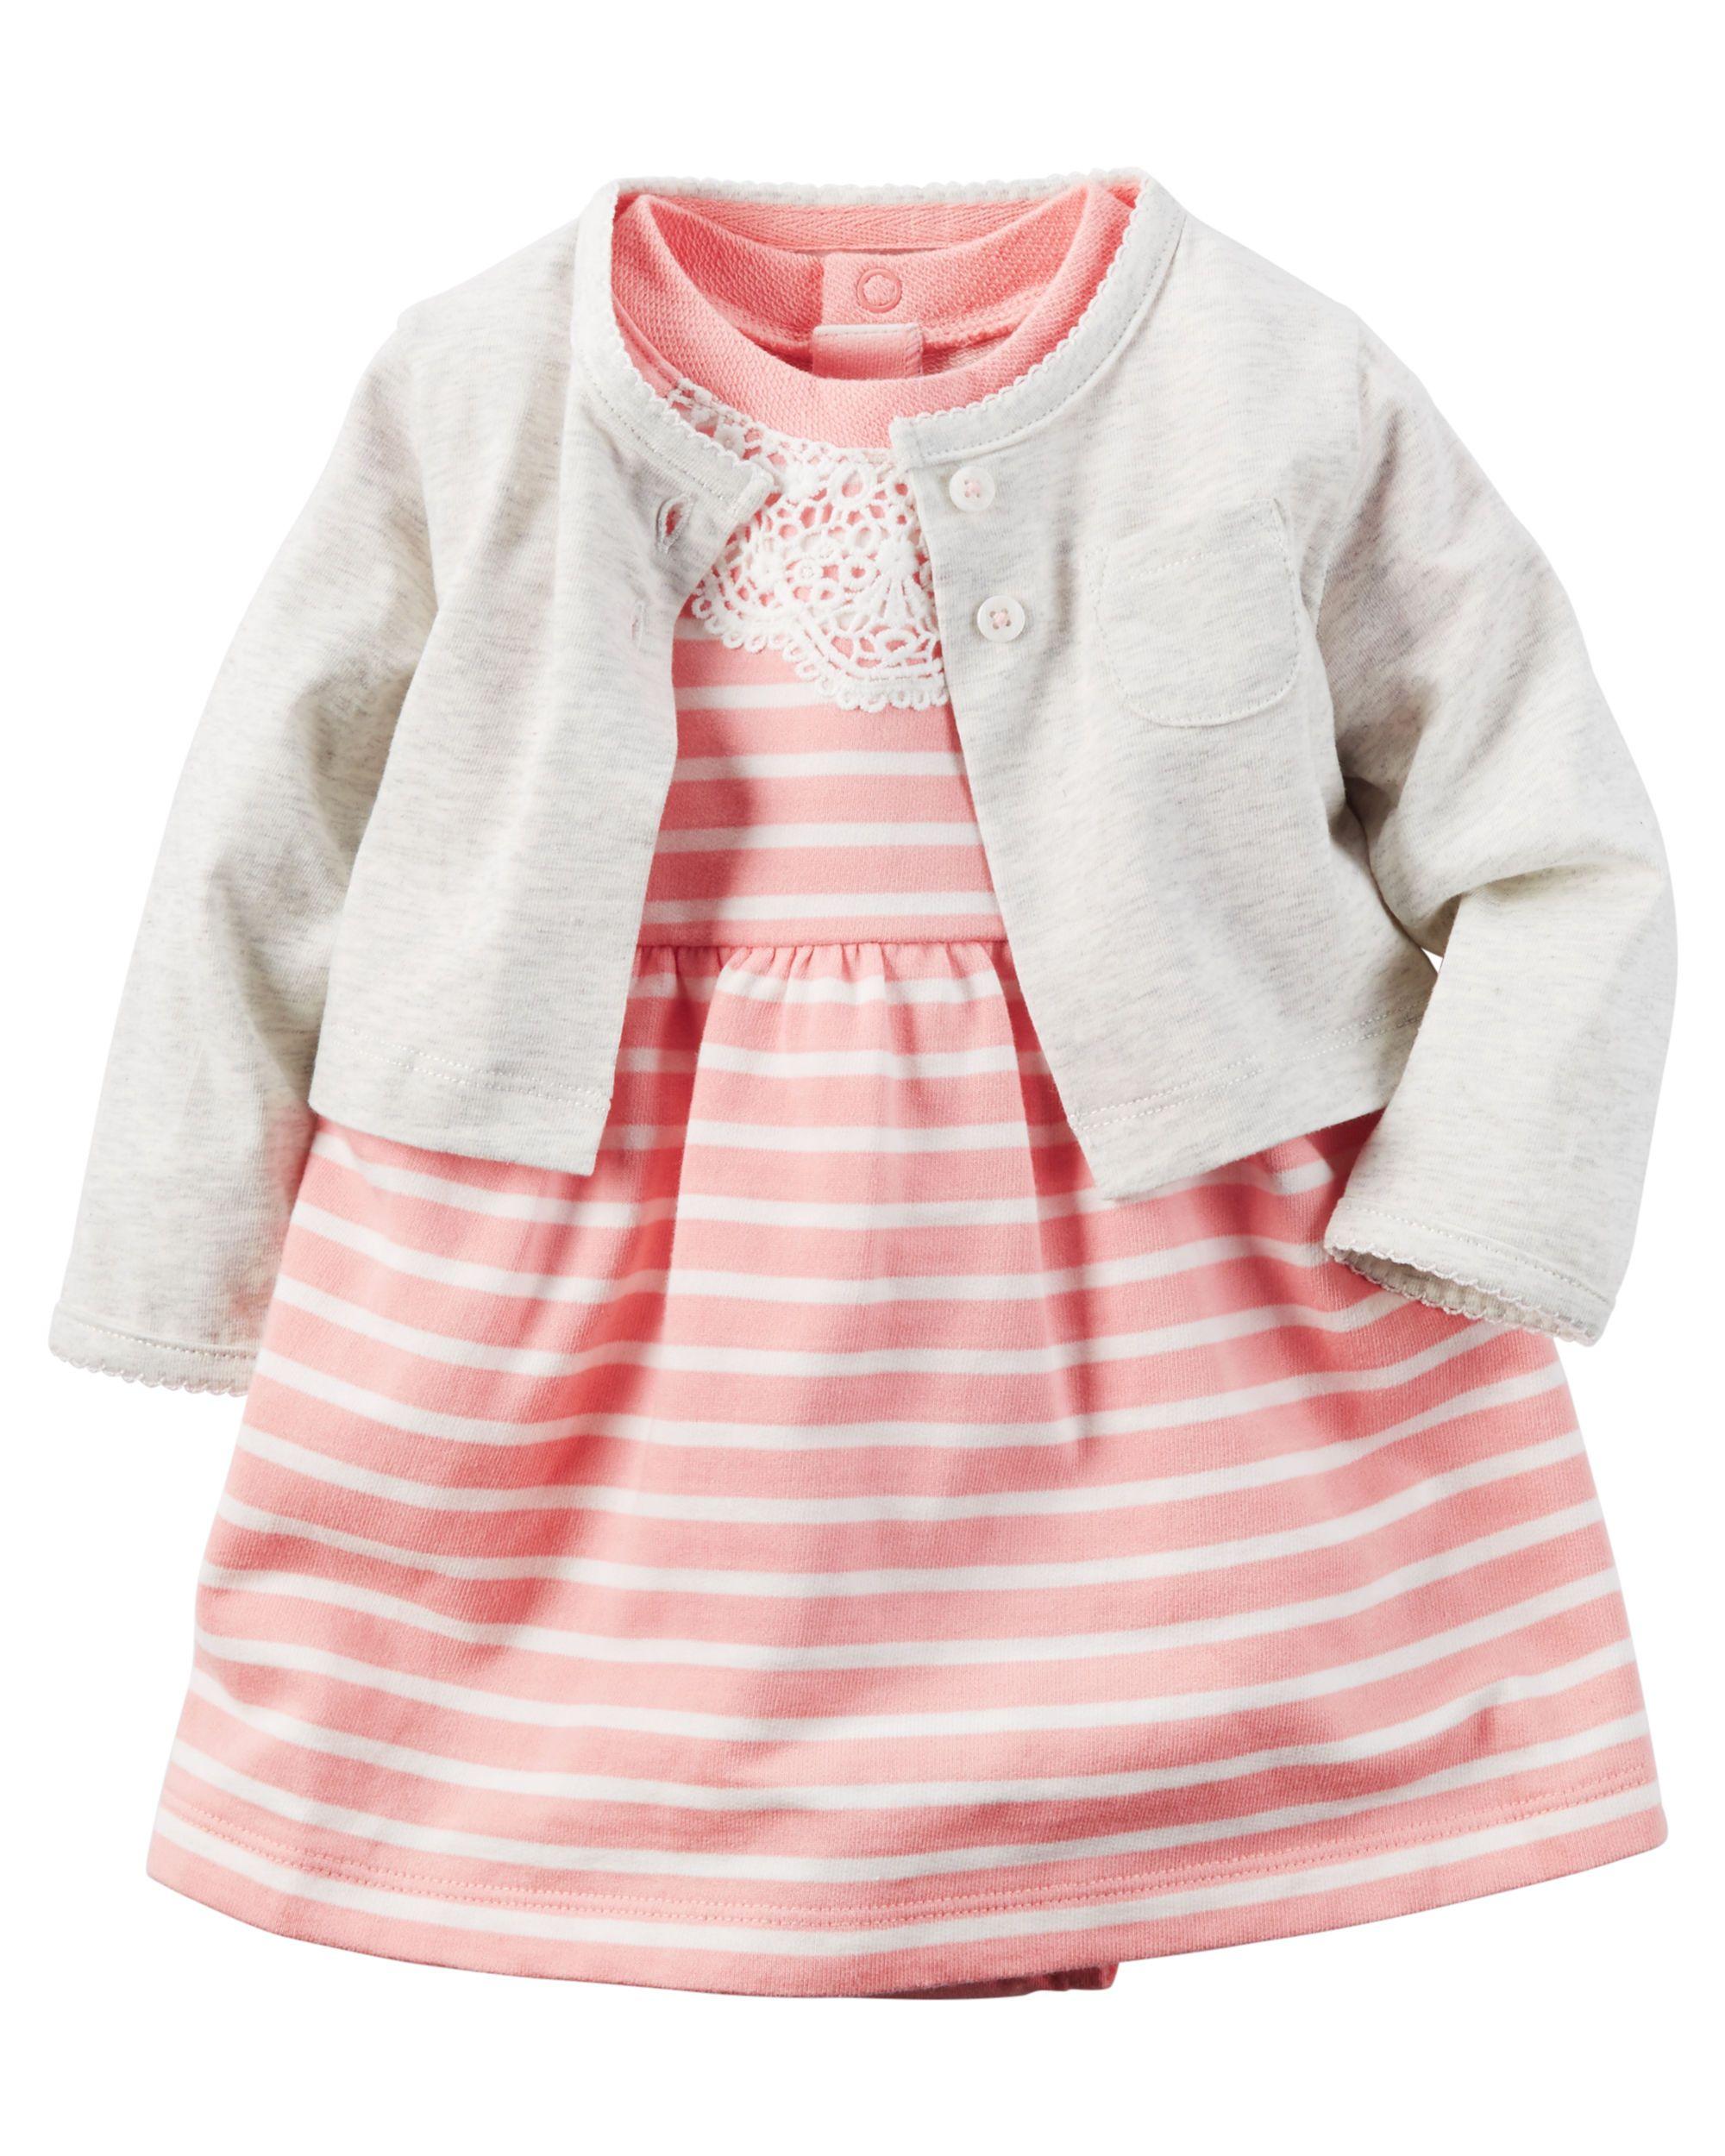 69af7a1b715 Baby Girl 2-Piece Bodysuit Dress   Cardigan Set